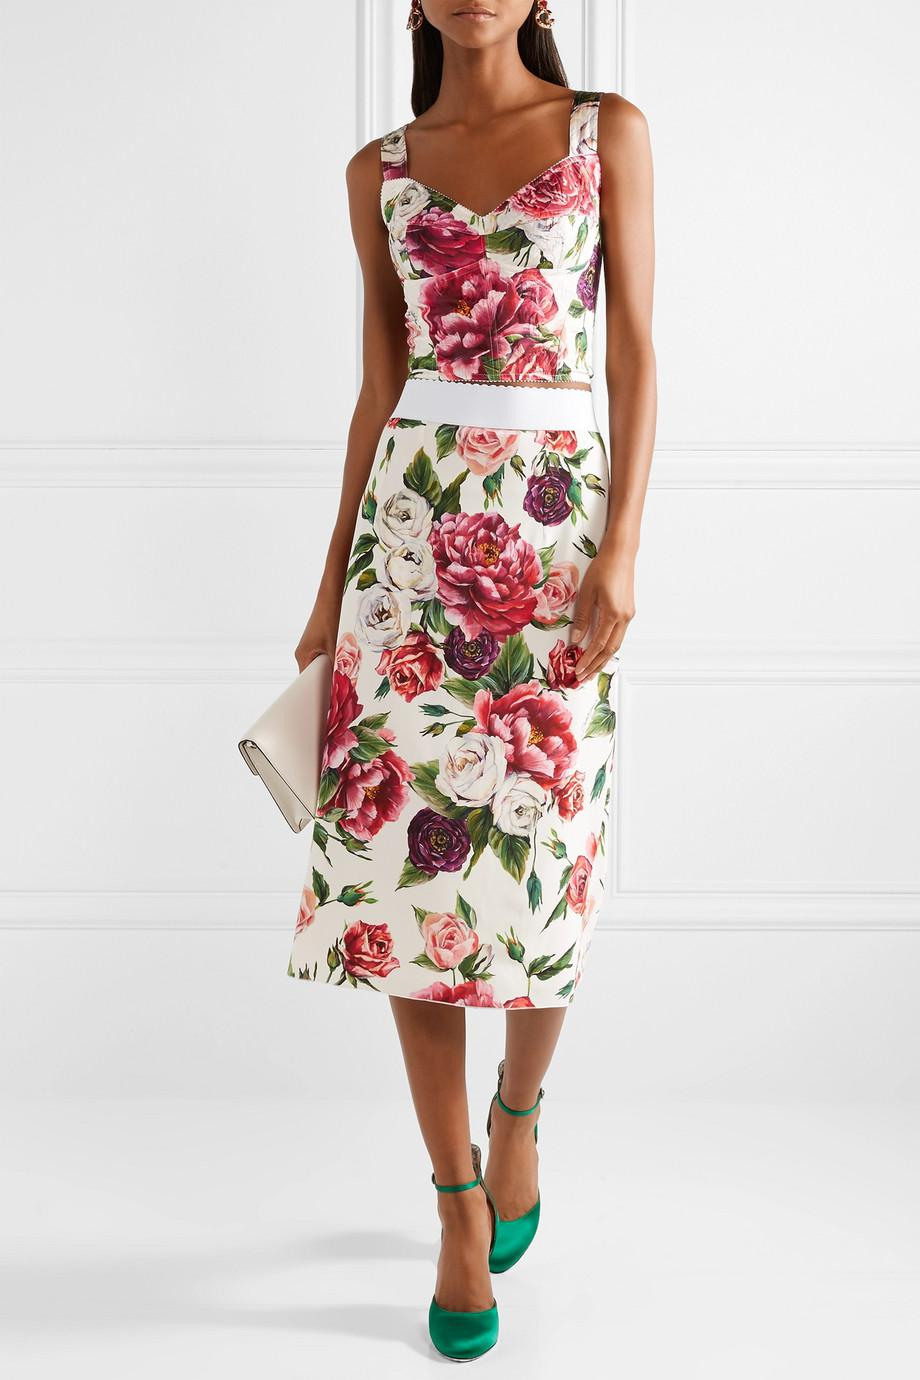 Lyst dolce gabbana floral print cady midi skirt in pink view fullscreen mightylinksfo